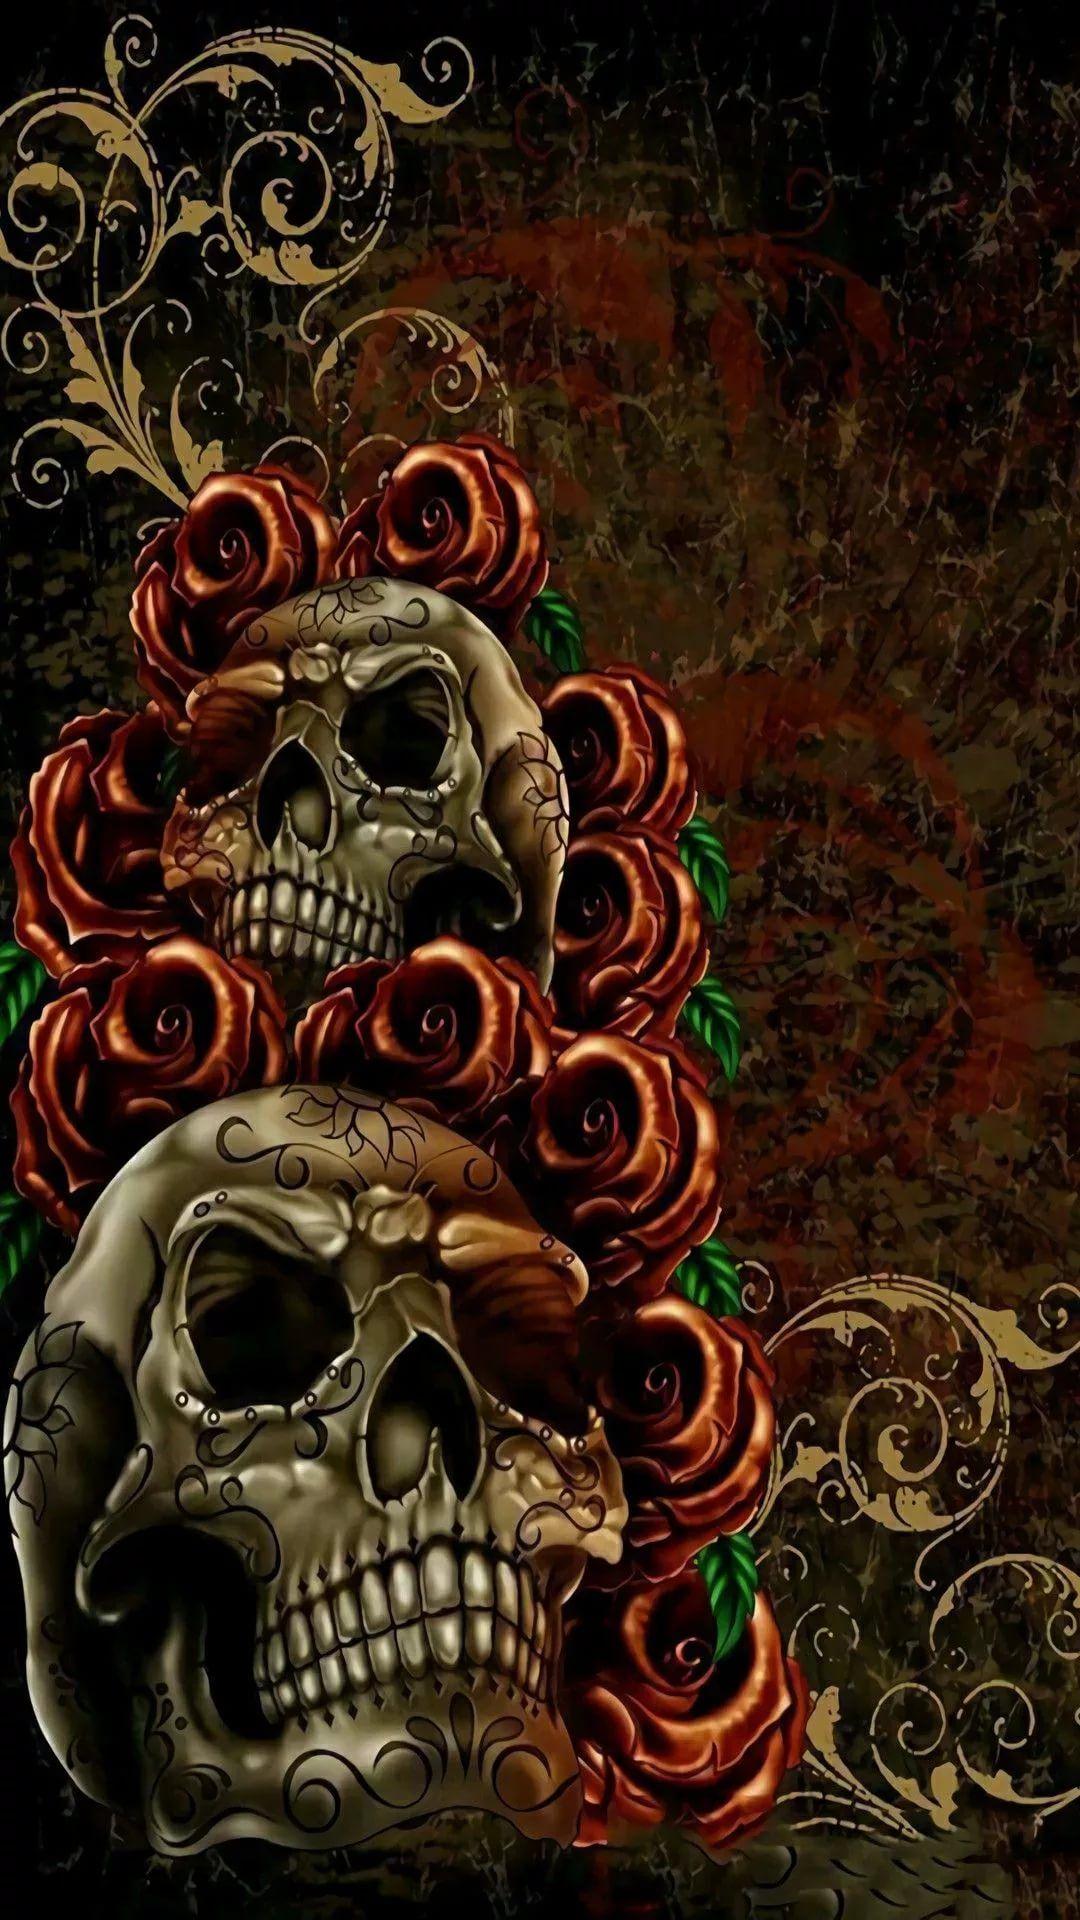 Skeleton iPhone 8 wallpaper